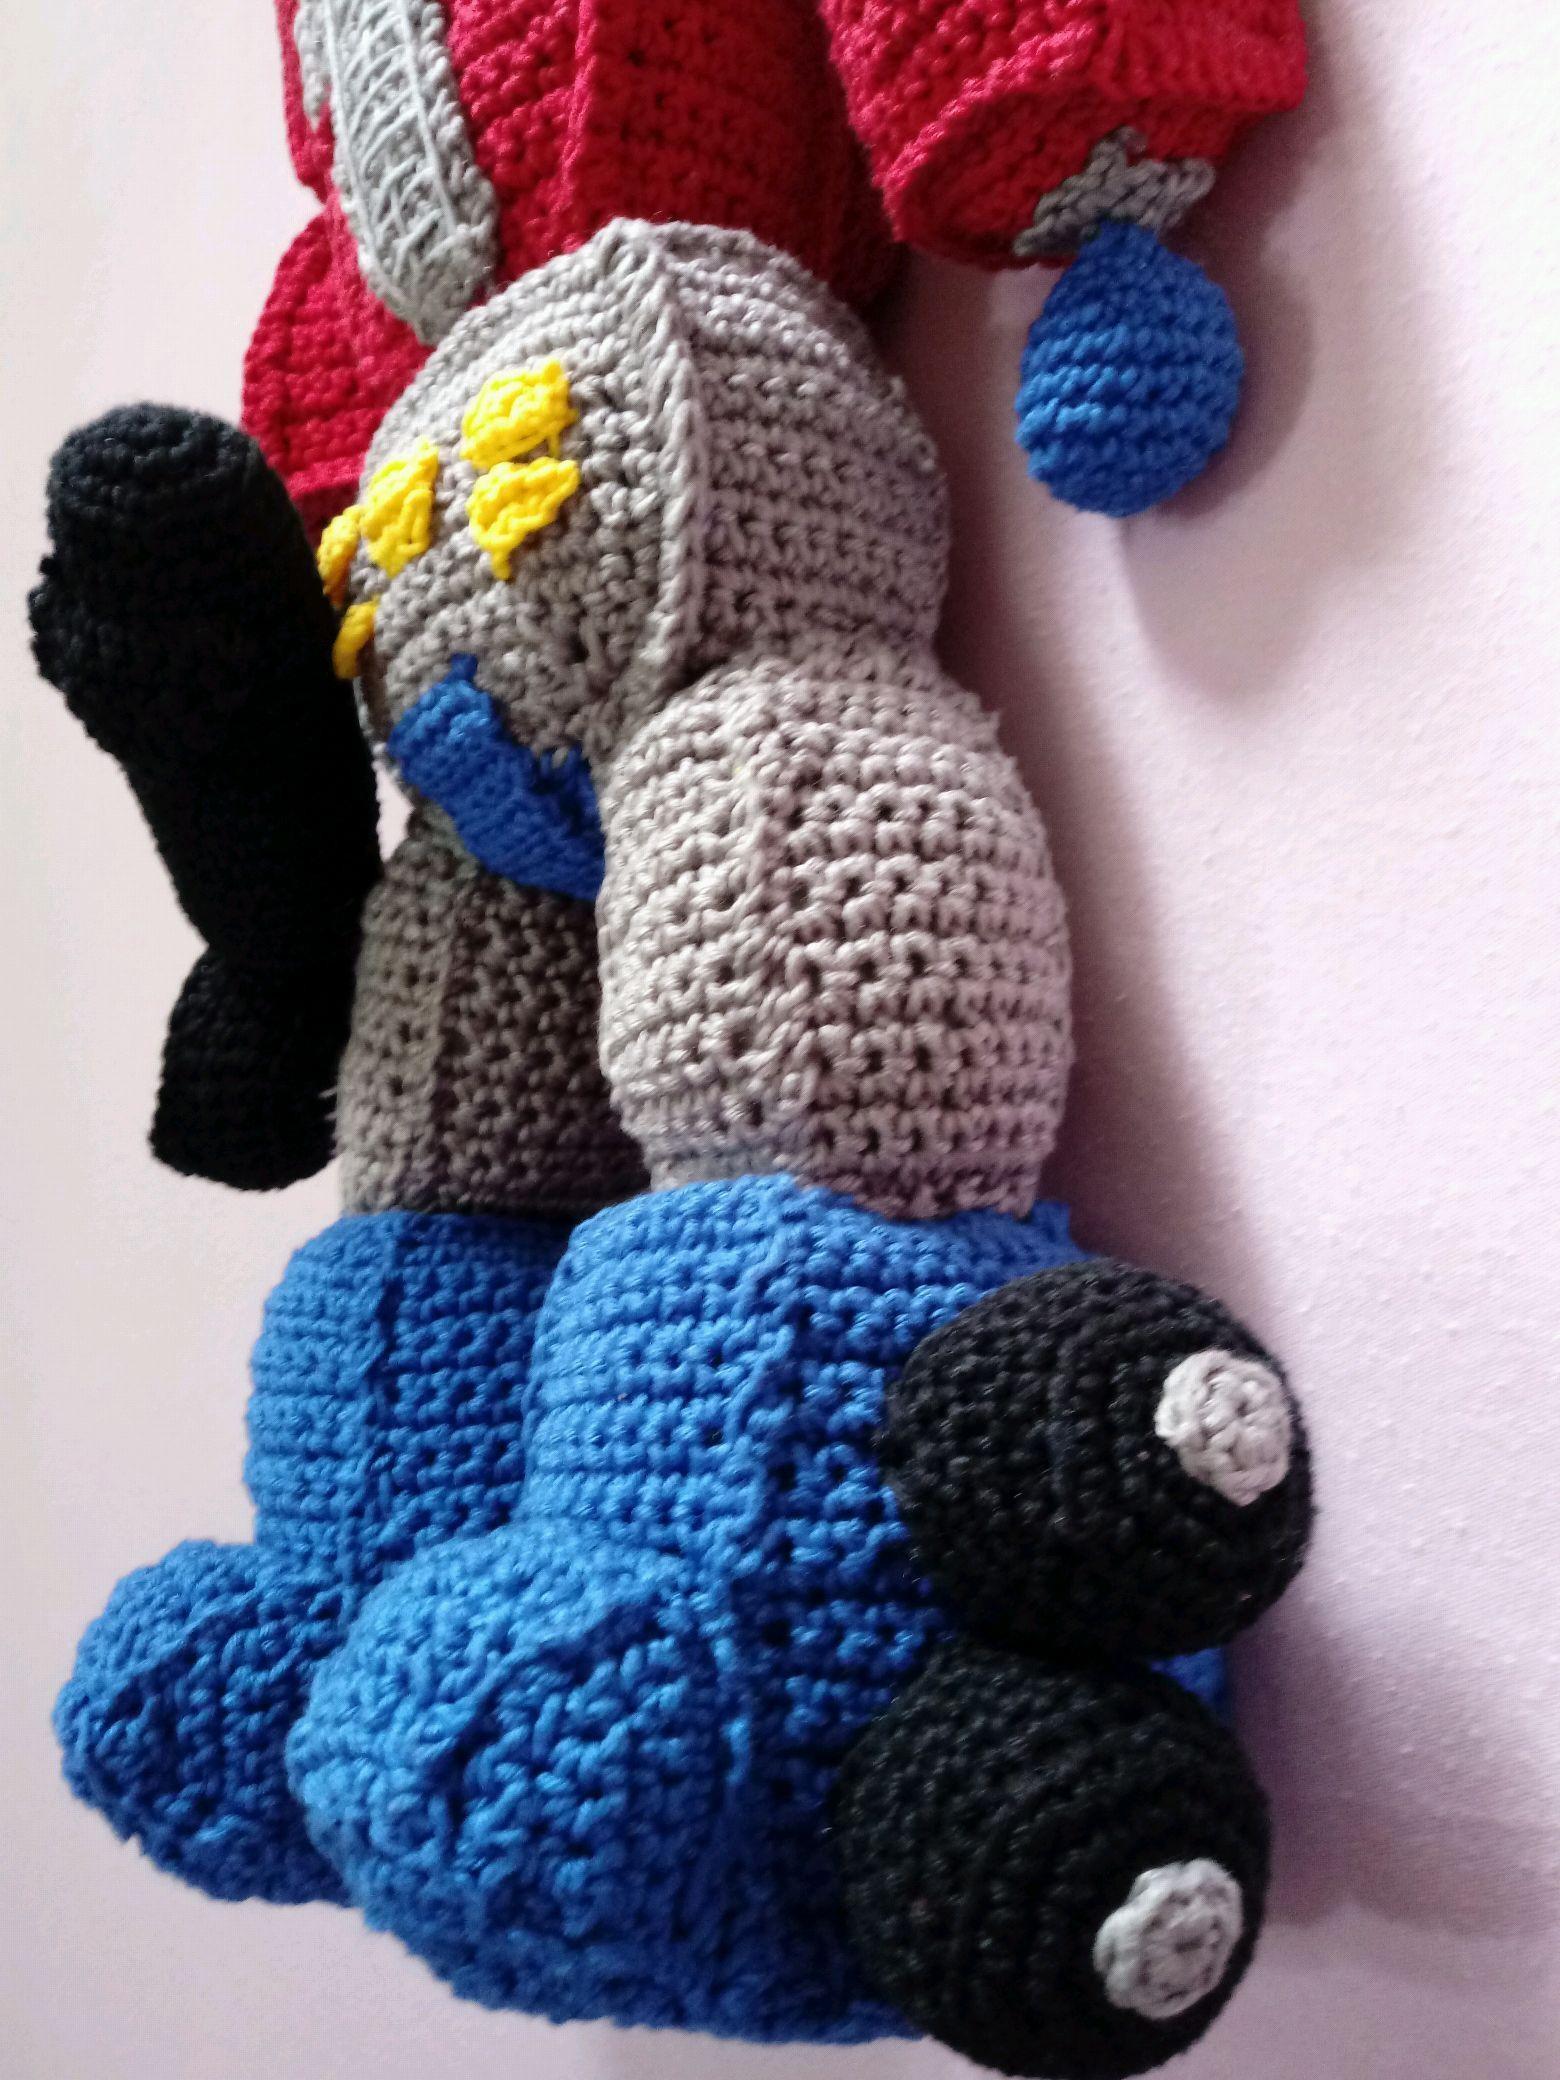 Optimus Prime Crochet Pattern Topsimages